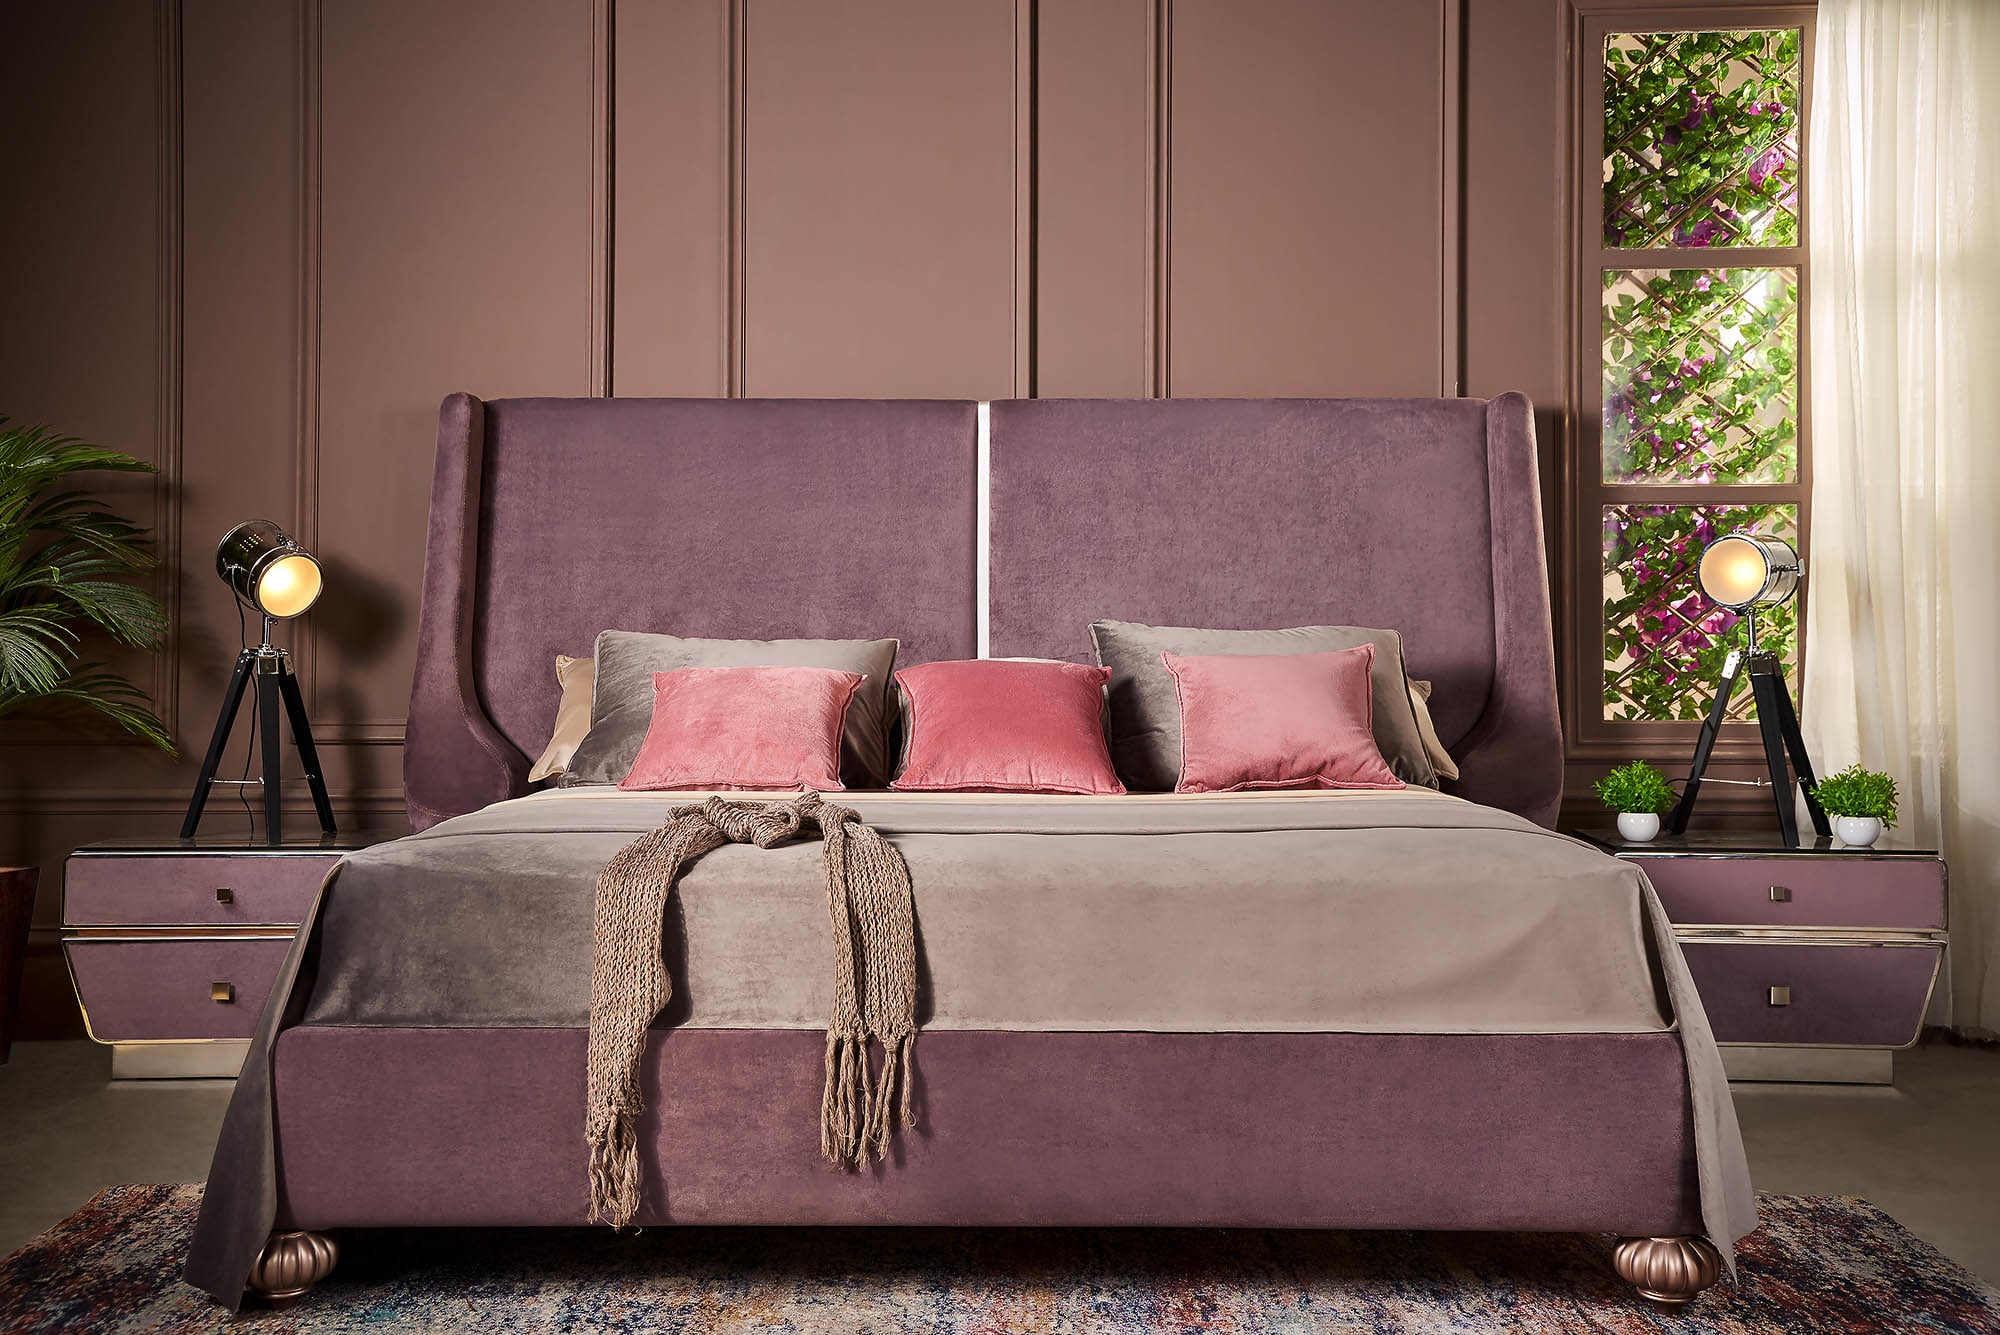 Luxury purple velvet bedroom - Richie by Shoulah - Furniture Photography - Egypt